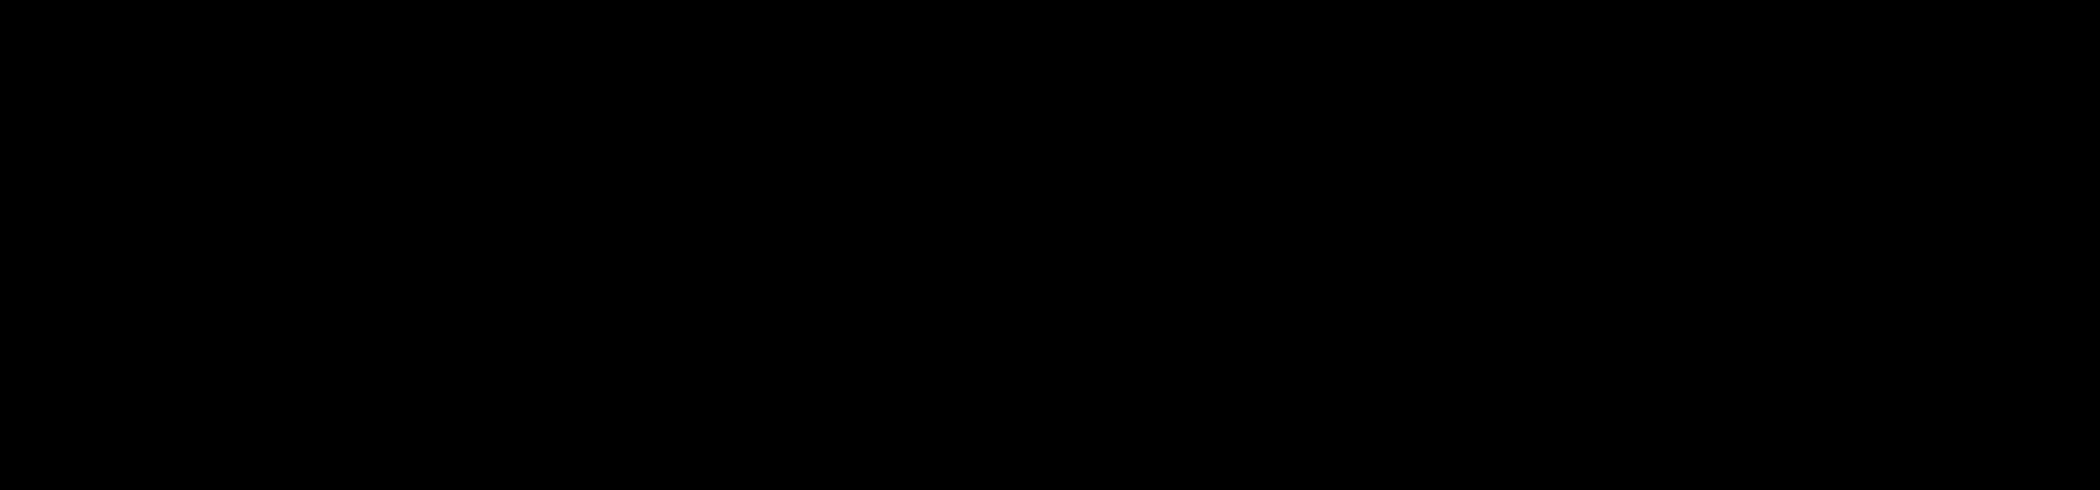 hdmi logo 4 - HDMI Logo